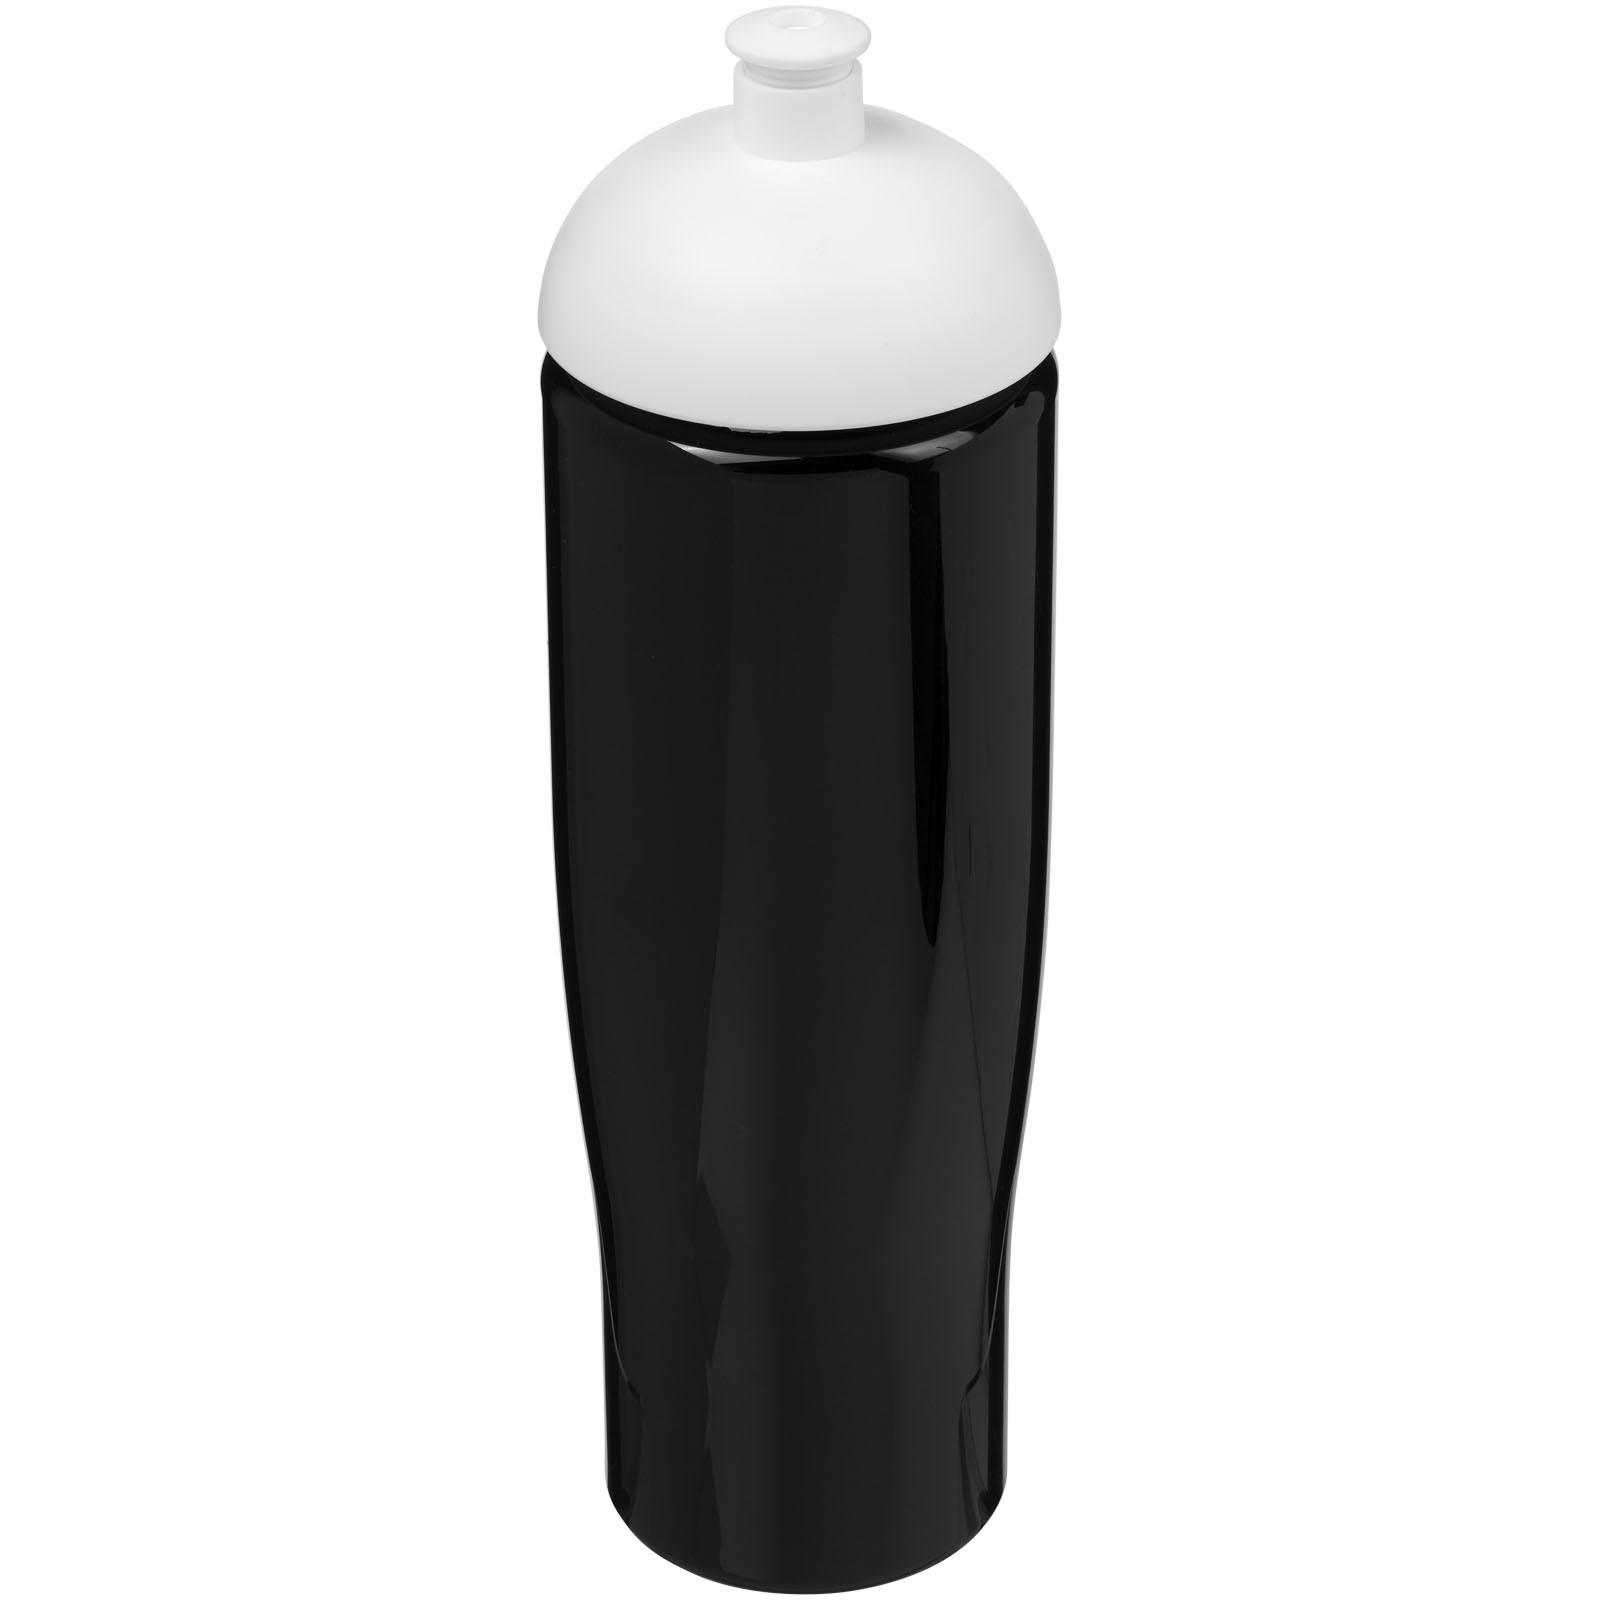 Sportovní láhev s kupolovitým víčkem H2O Tempo® 700 ml - Černá / Bílá